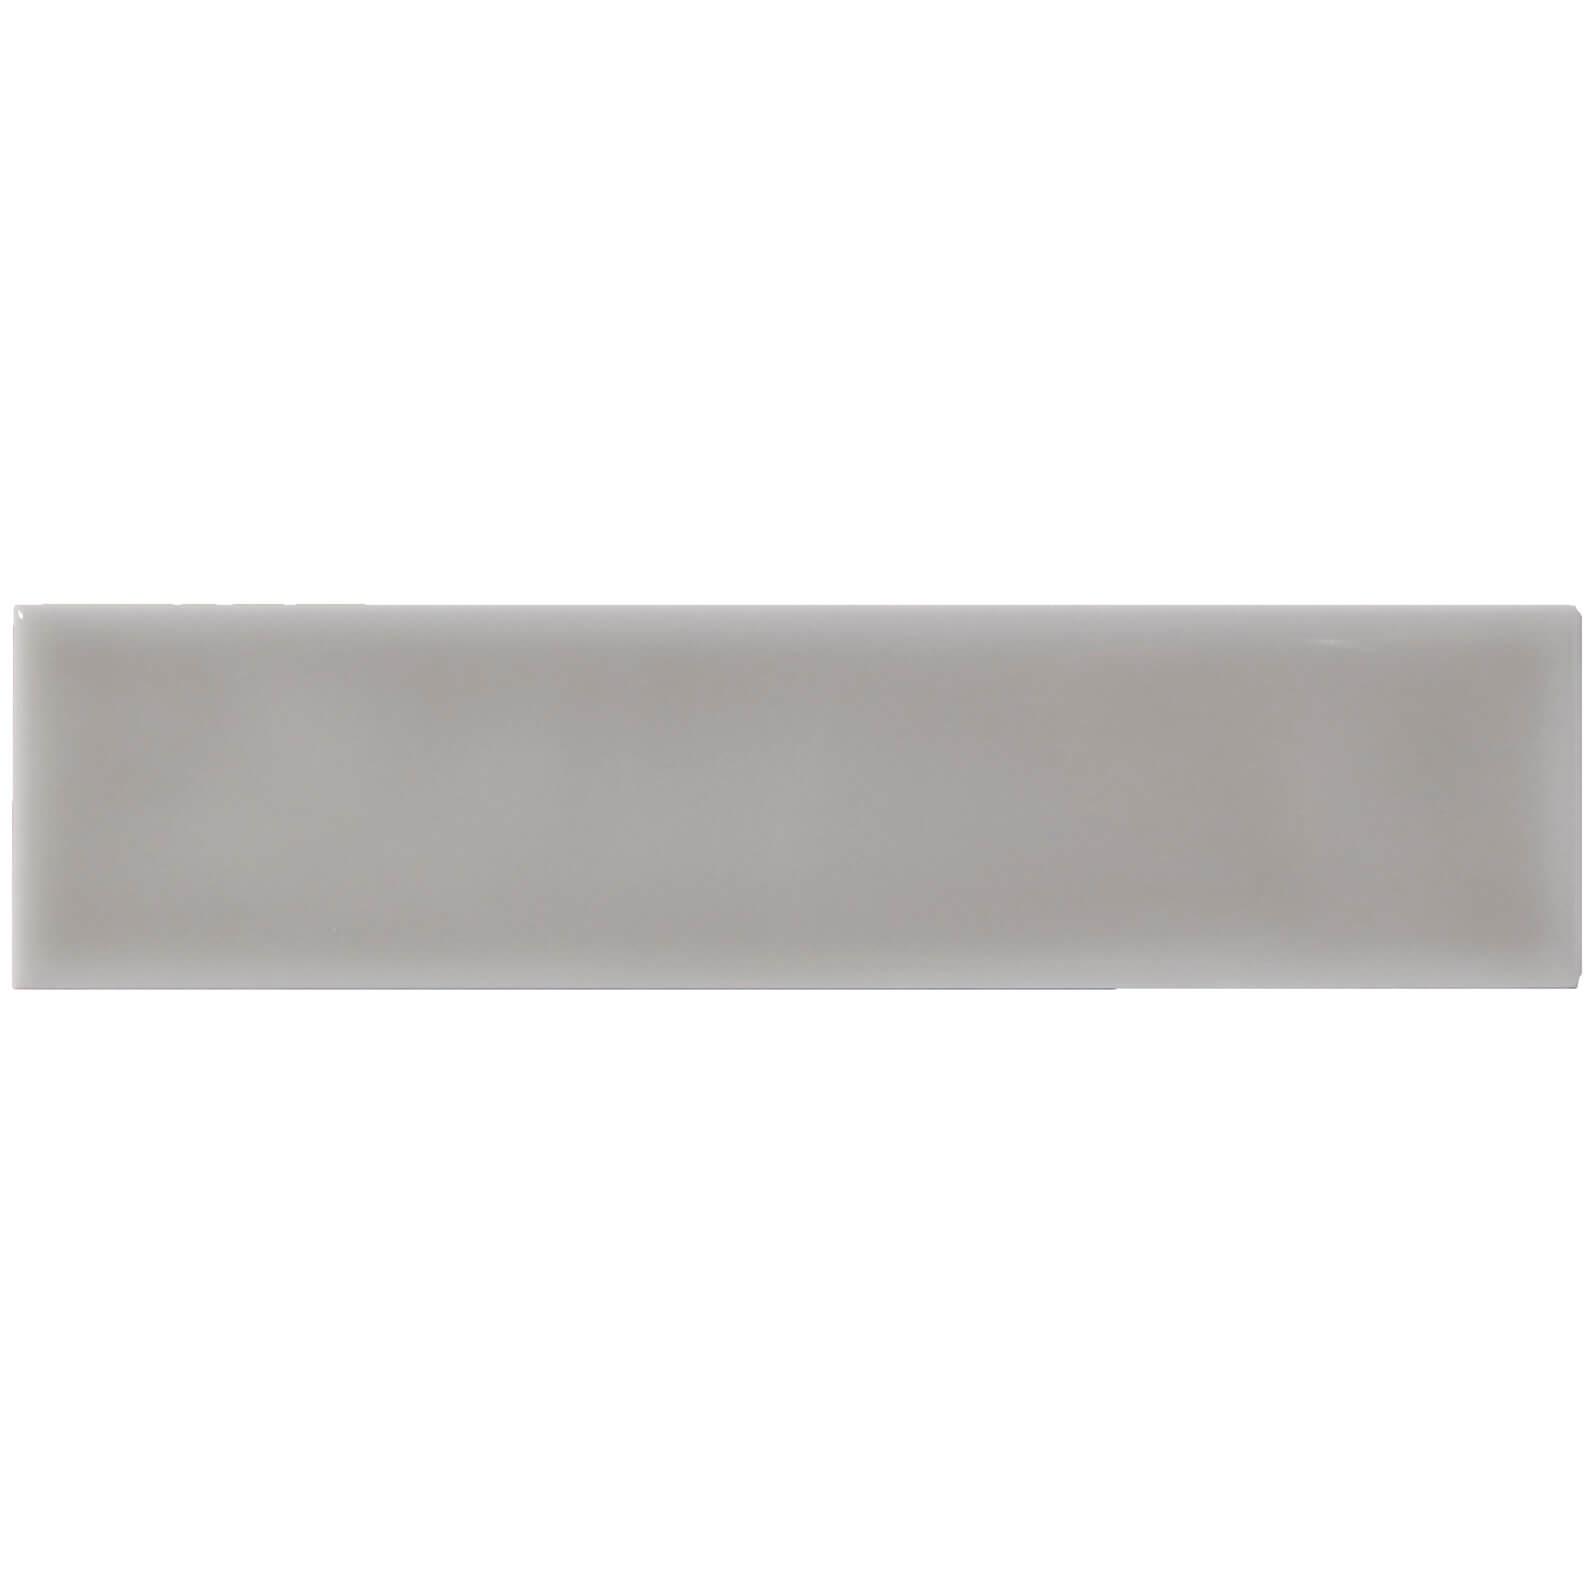 ADST1041 - LISO  - 4.9 cm X 19.8 cm